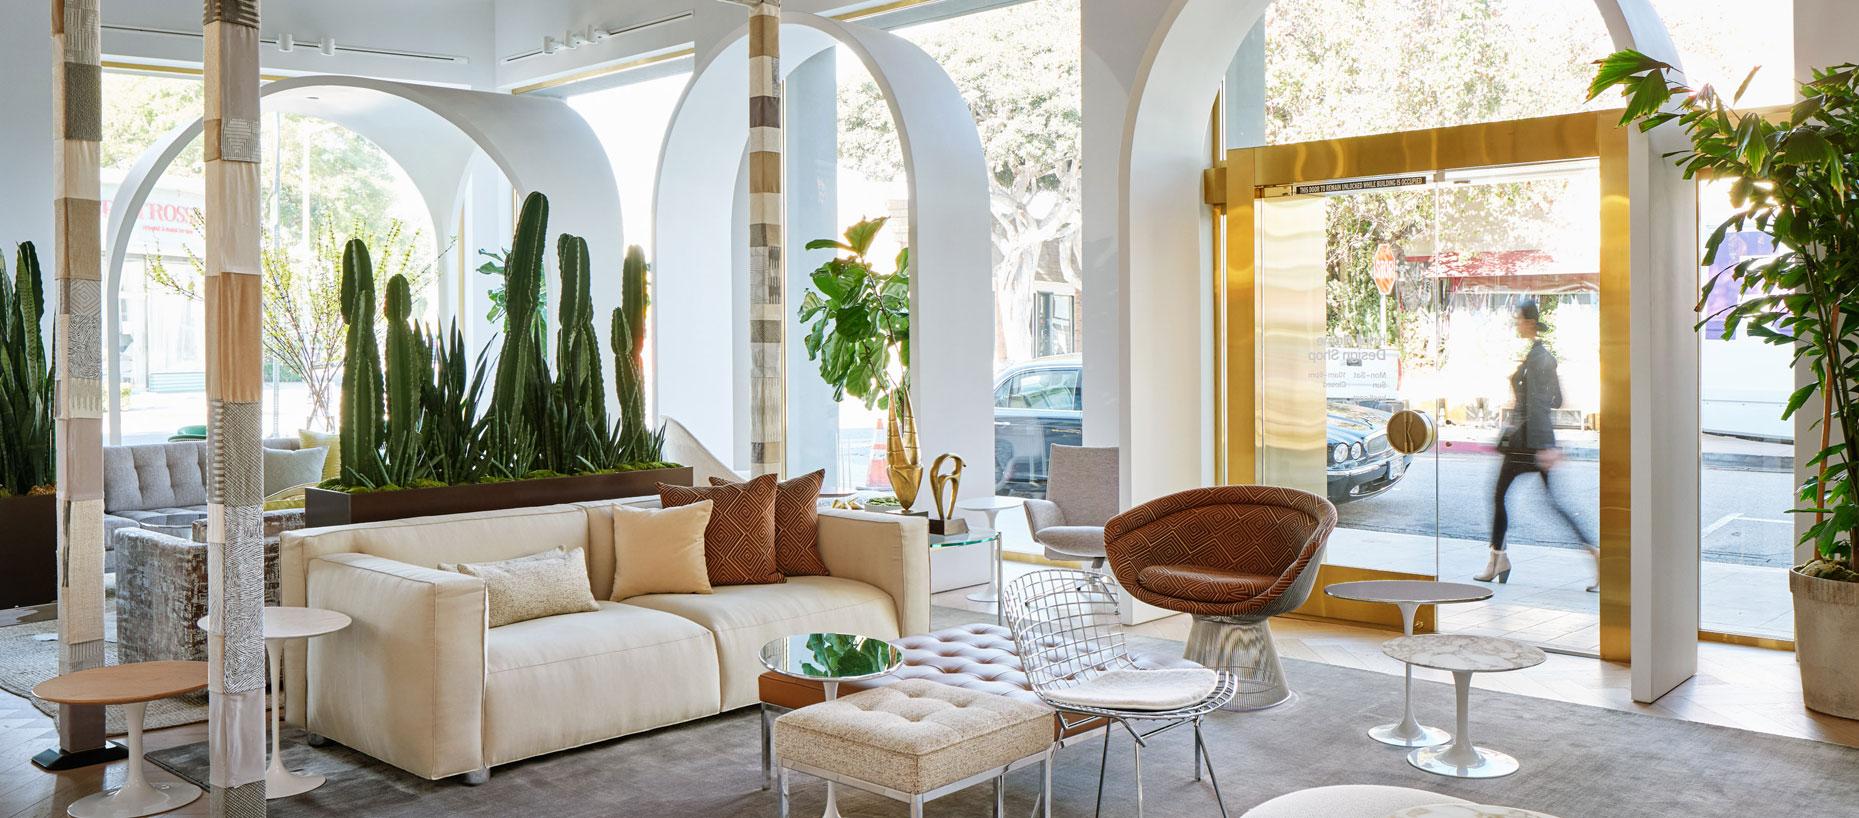 Knoll Los Angeles Home Design Shop